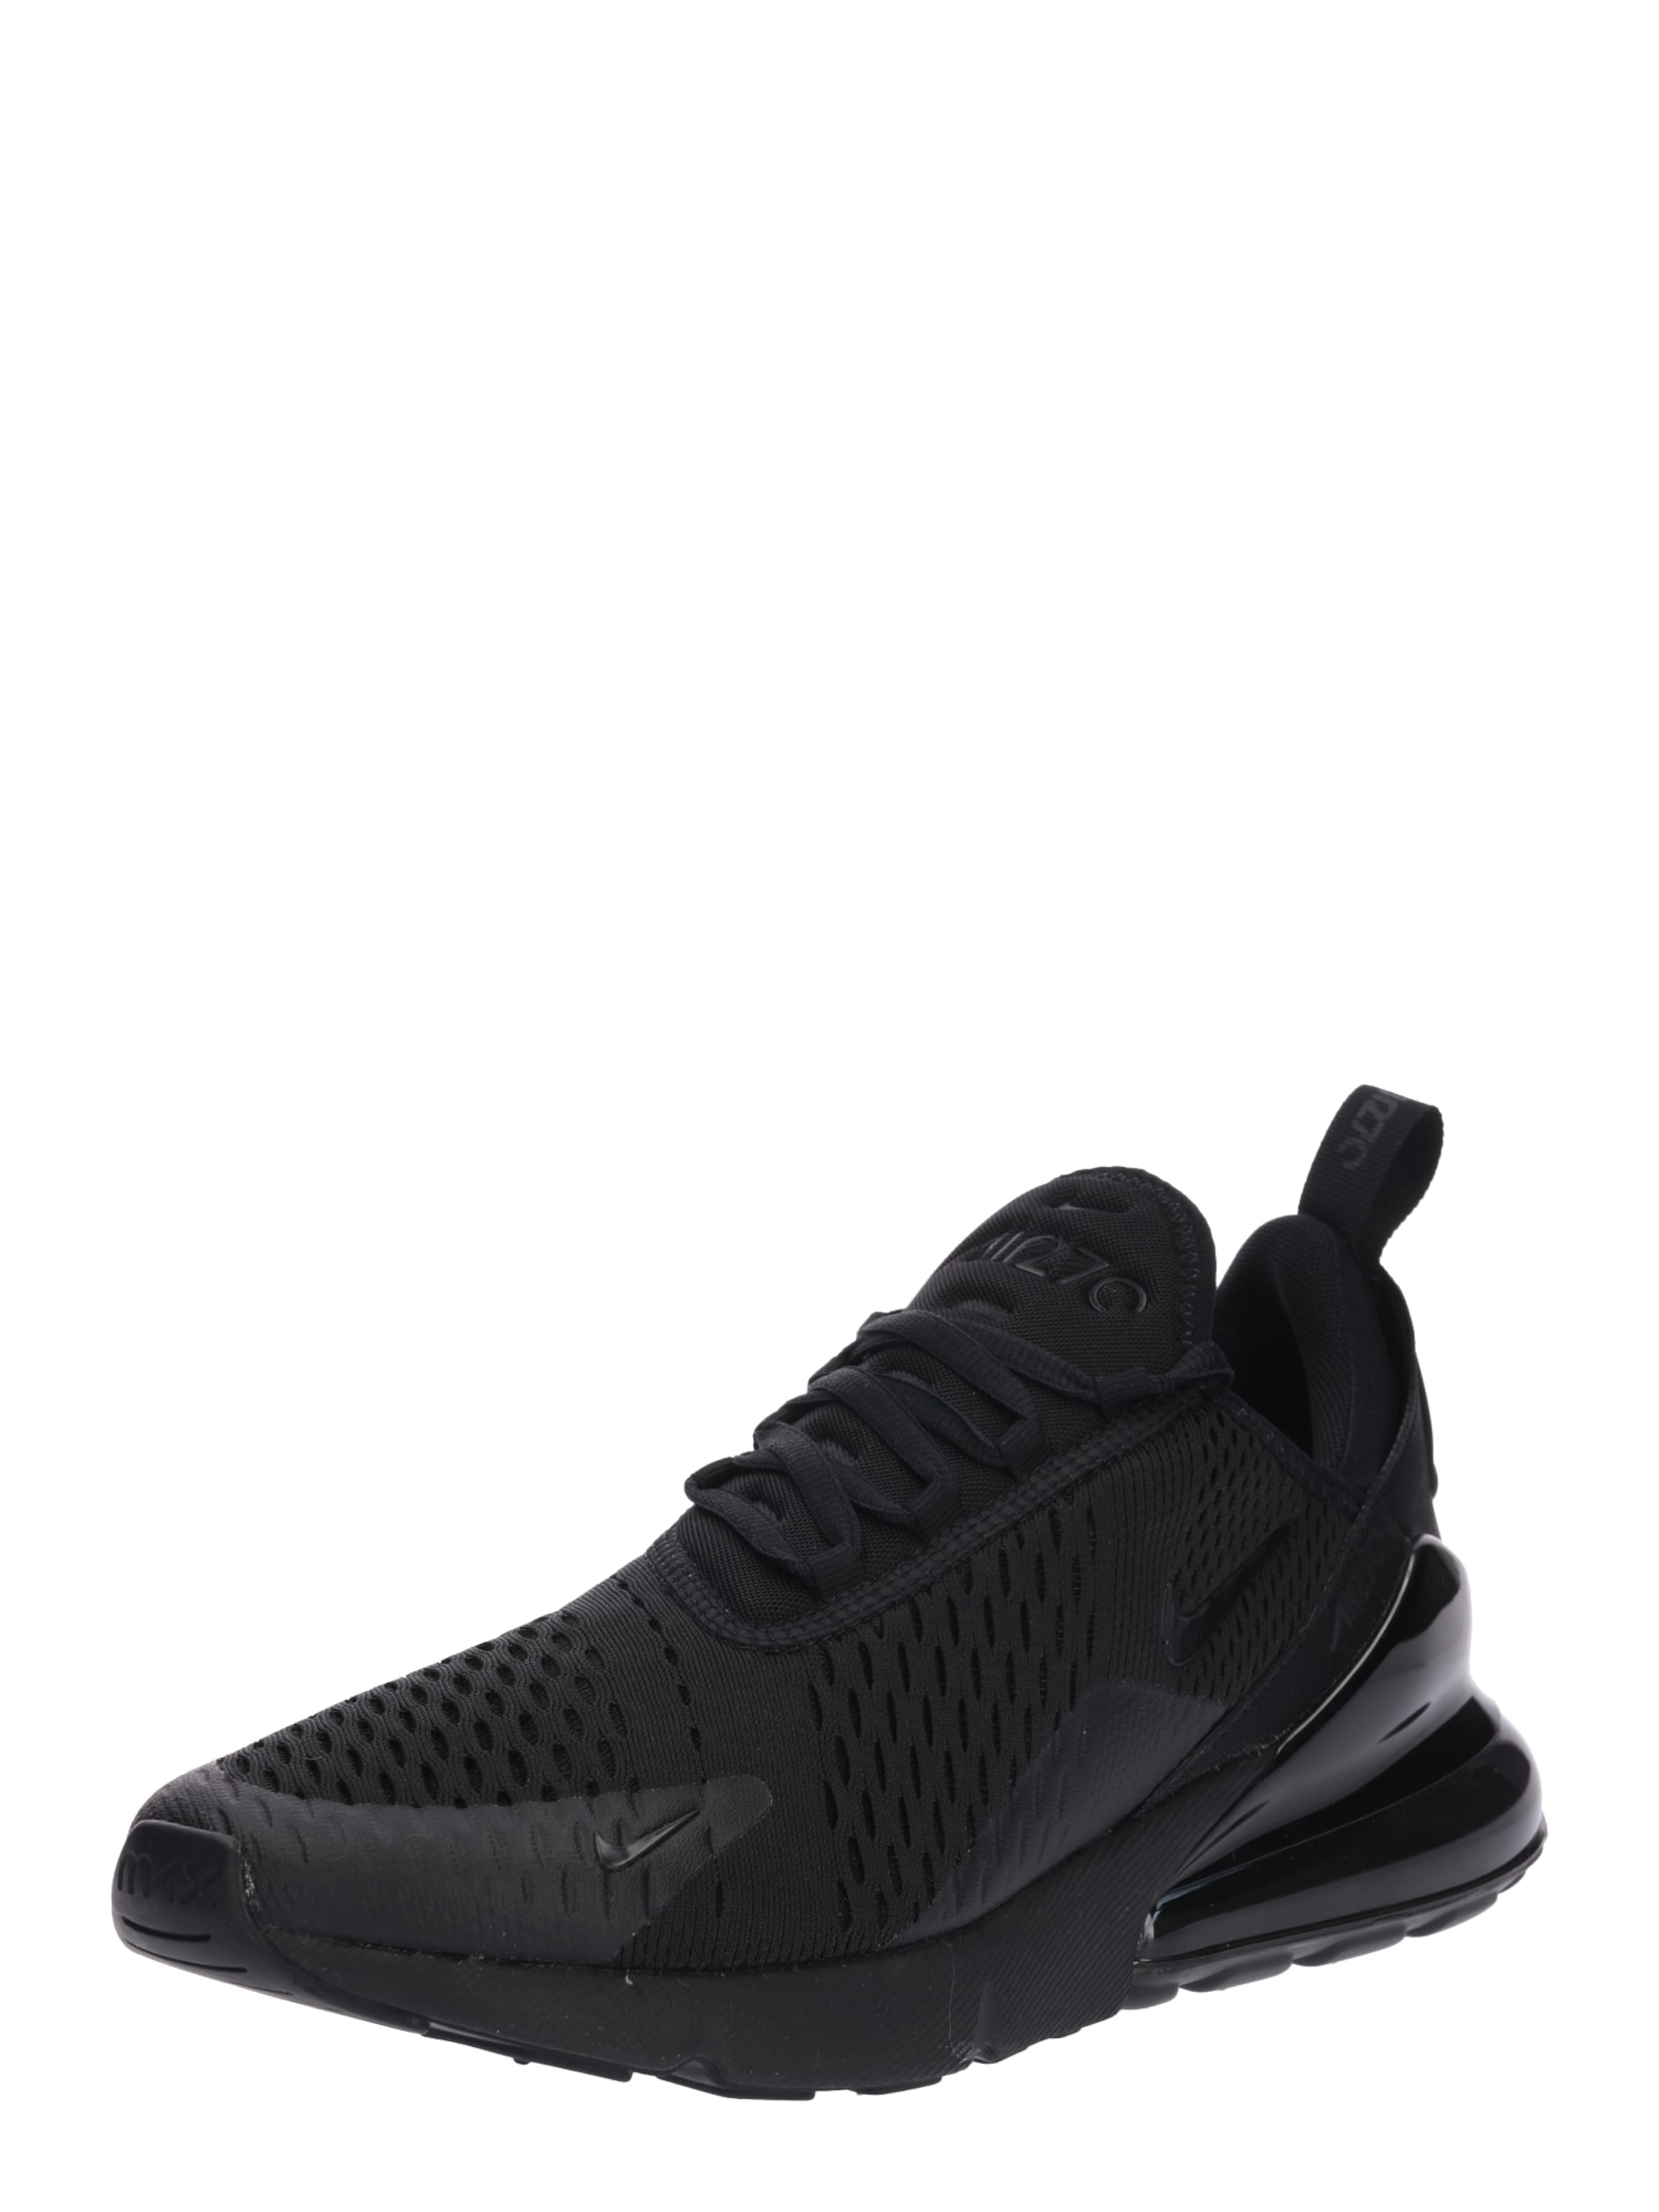 Sportswear MischfarbenSchwarz Sneaker 270' In Max 'air Nike Weiß FKc1Jl3T